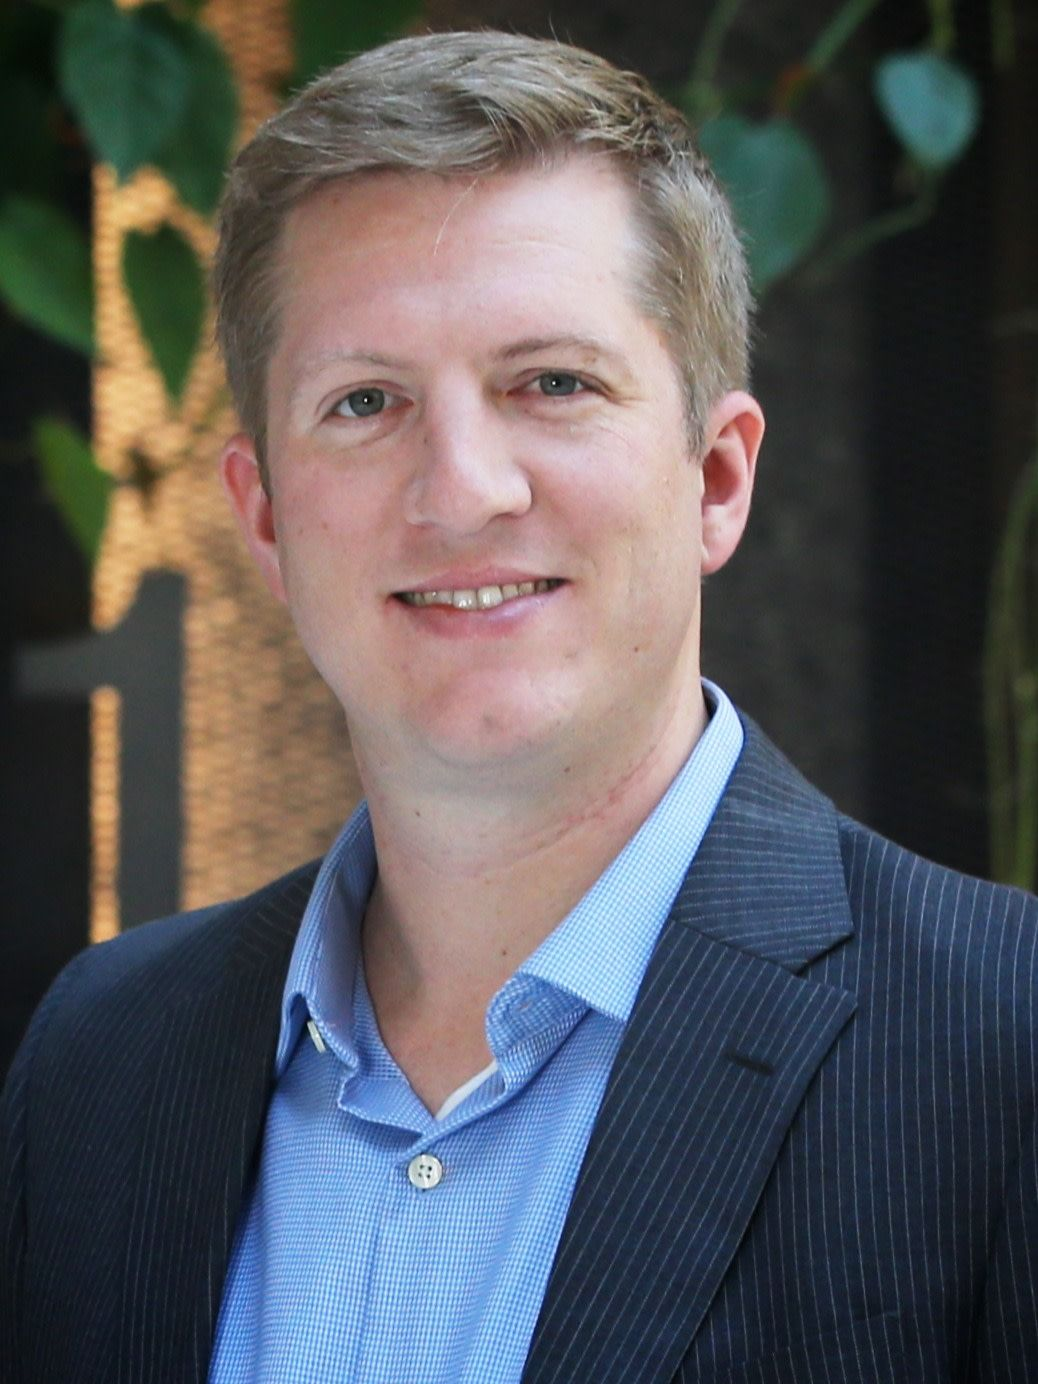 Sezzle Promotes Paul Paradis to President, Names Veronica Katz new Chief Revenue Officer, Sezzle